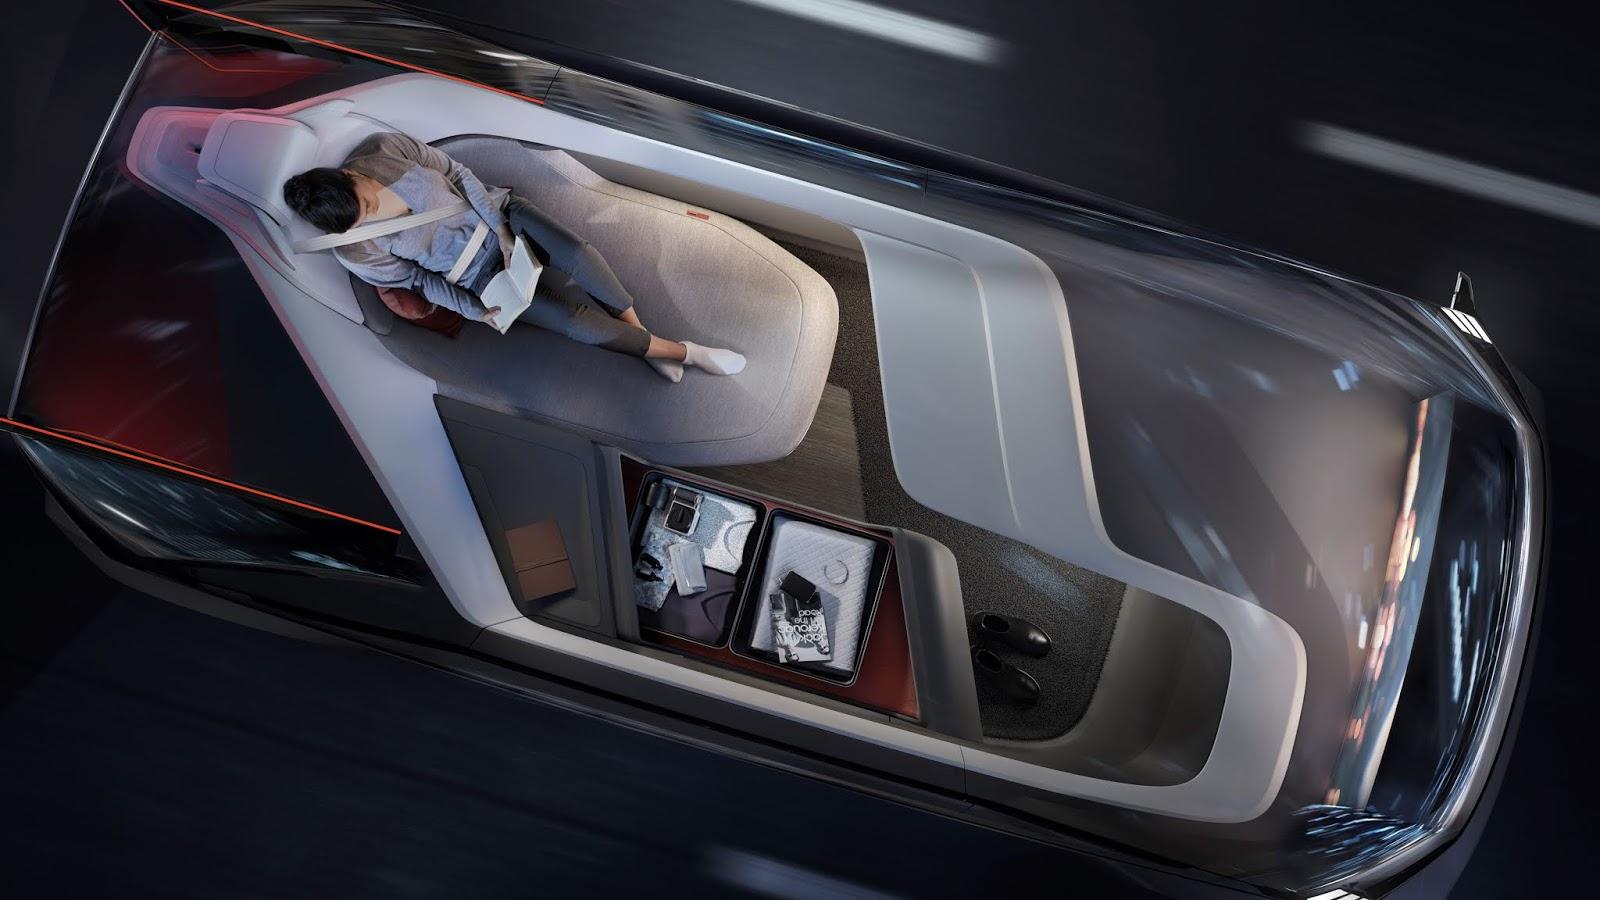 237054 Volvo 360c Interior Sleeping Το όραμα της Volvo χωρίς... τιμόνι Electric cars, Volvo, αυτόνομα, Αυτόνομη οδήγηση, Τεχνολογία